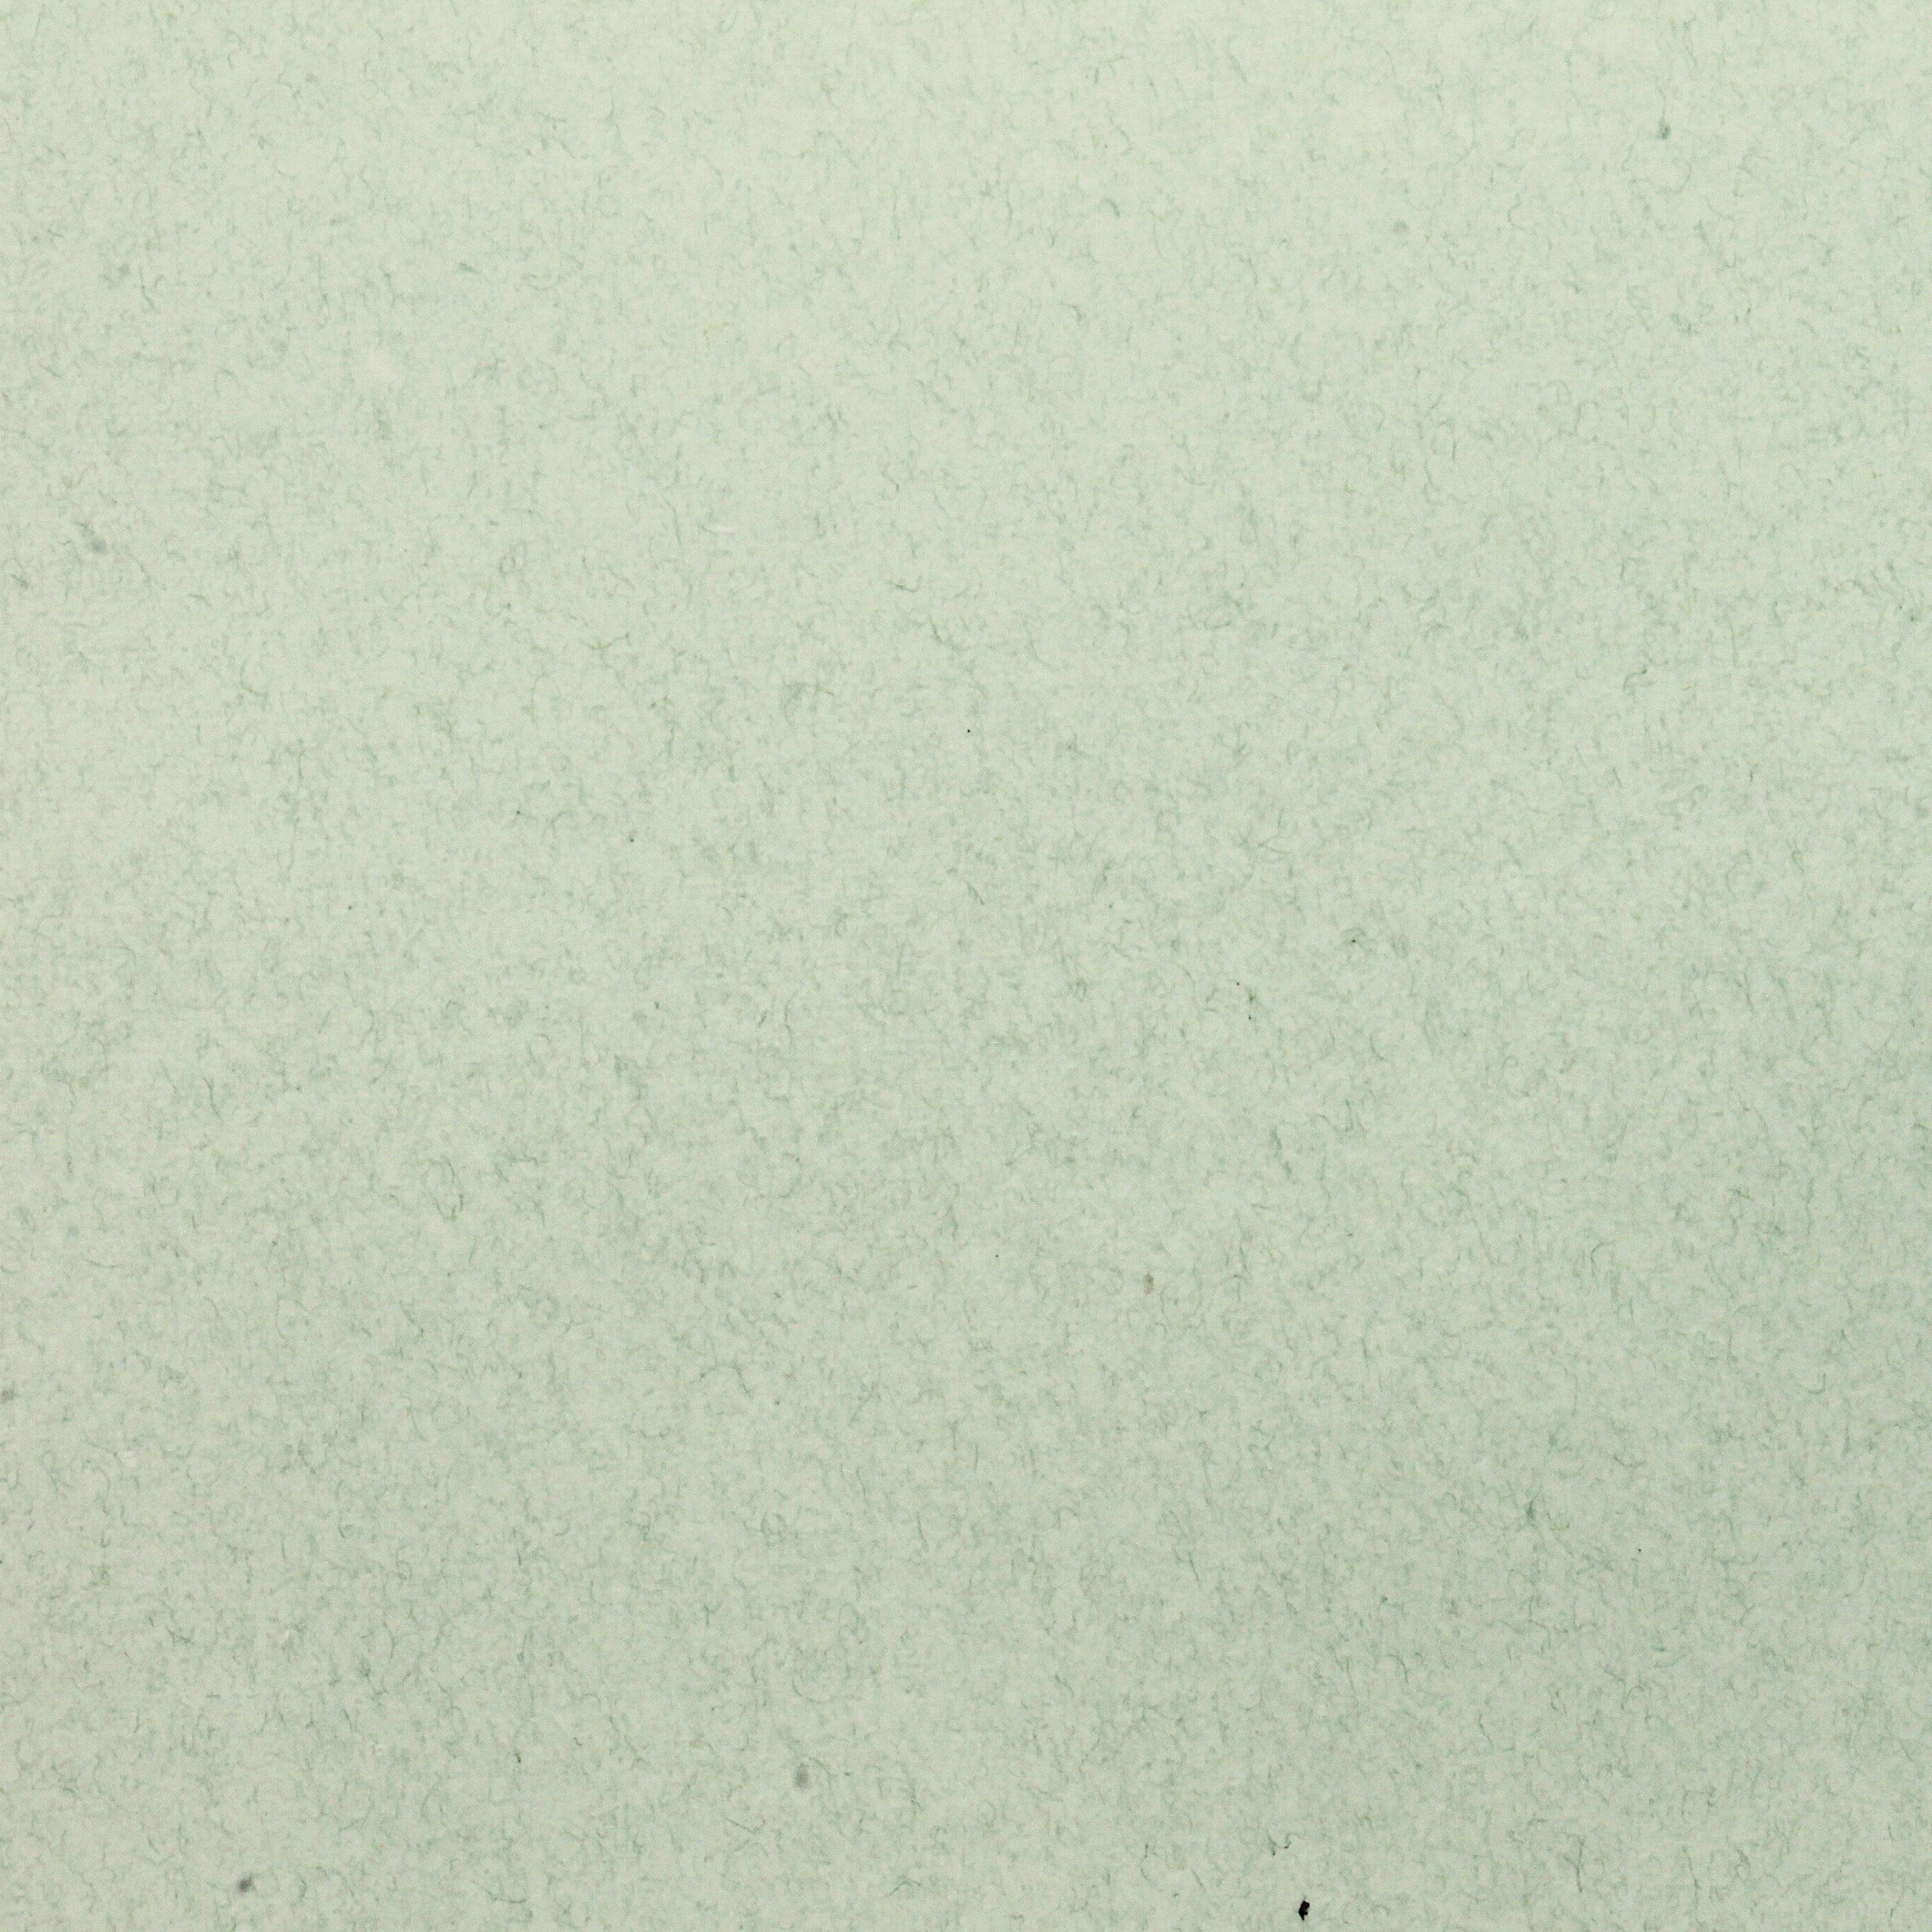 papel de algodon verde